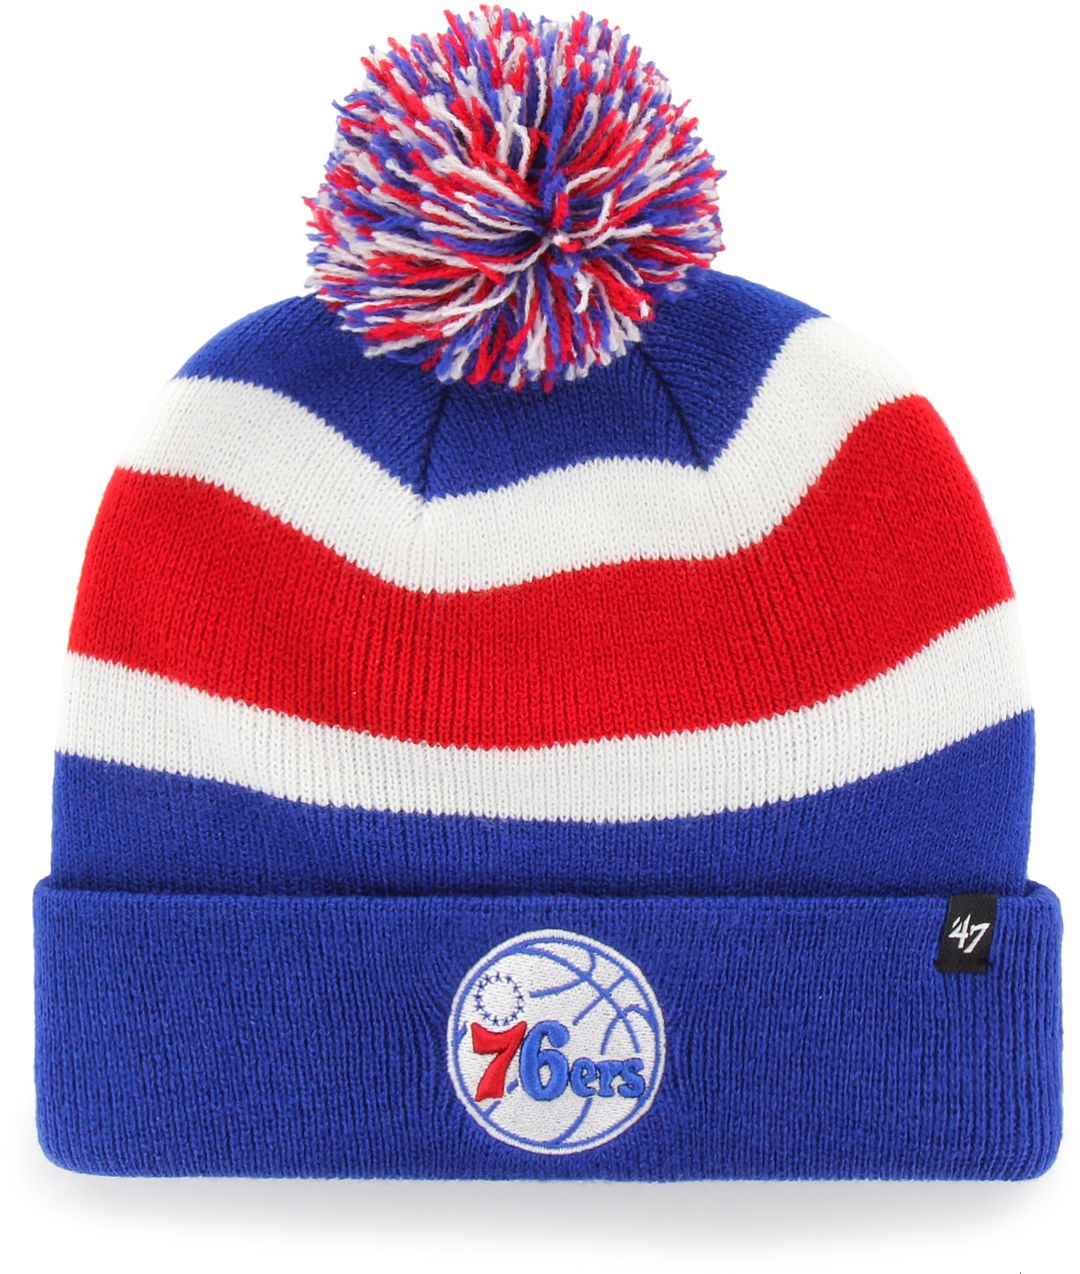 sneakers for cheap 547da f2126 47 Men s Philadelphia 76ers Breakaway Knit Hat   DICK S Sporting Goods